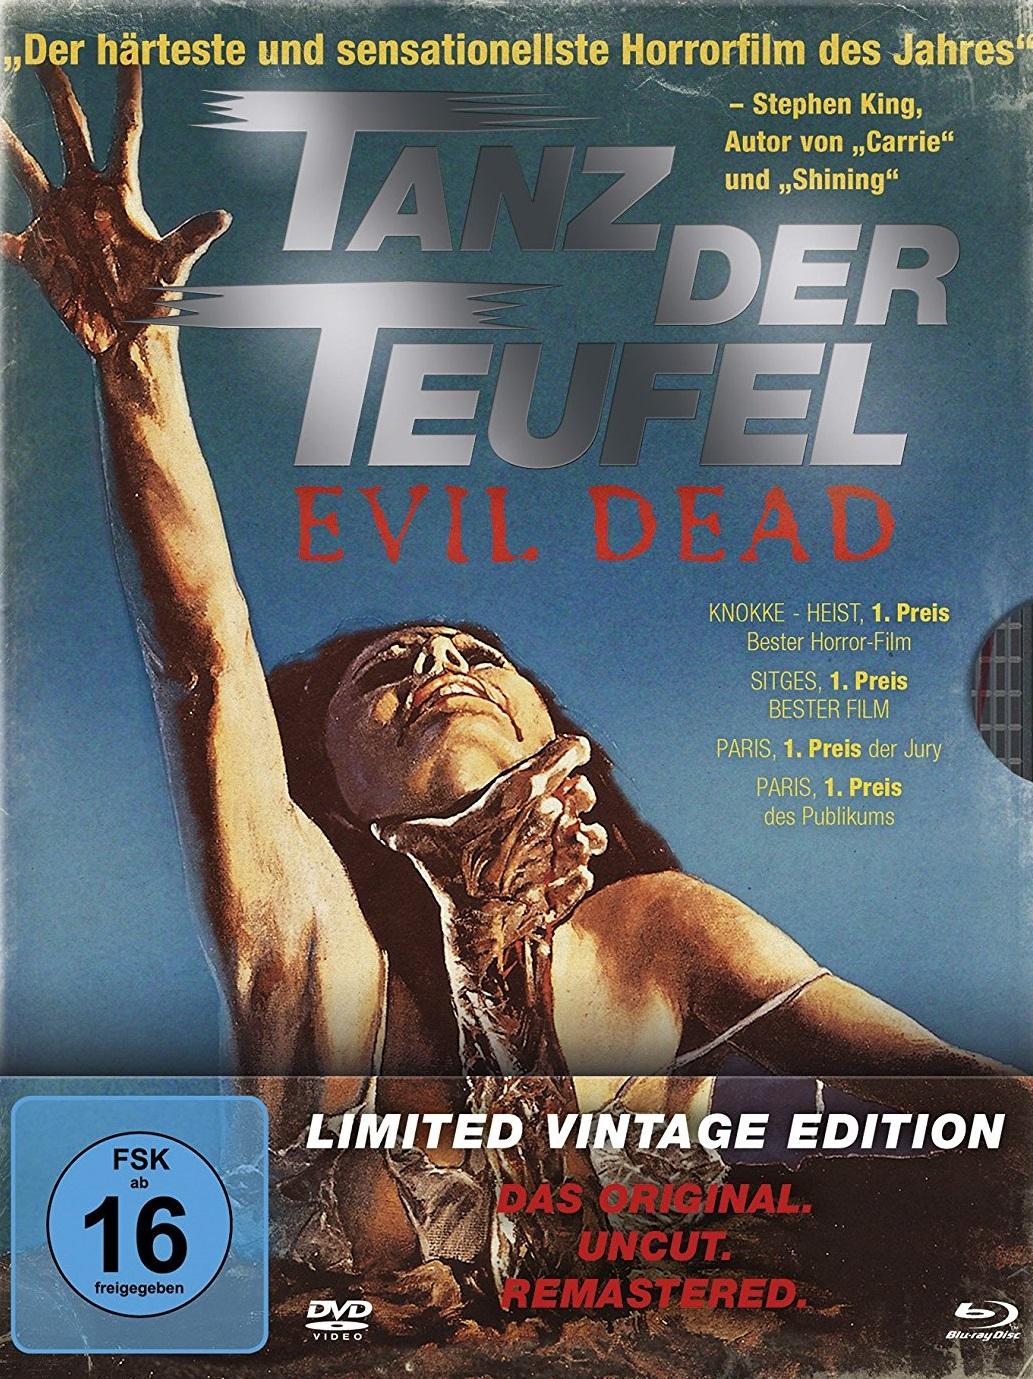 tanz der teufel book of the dead